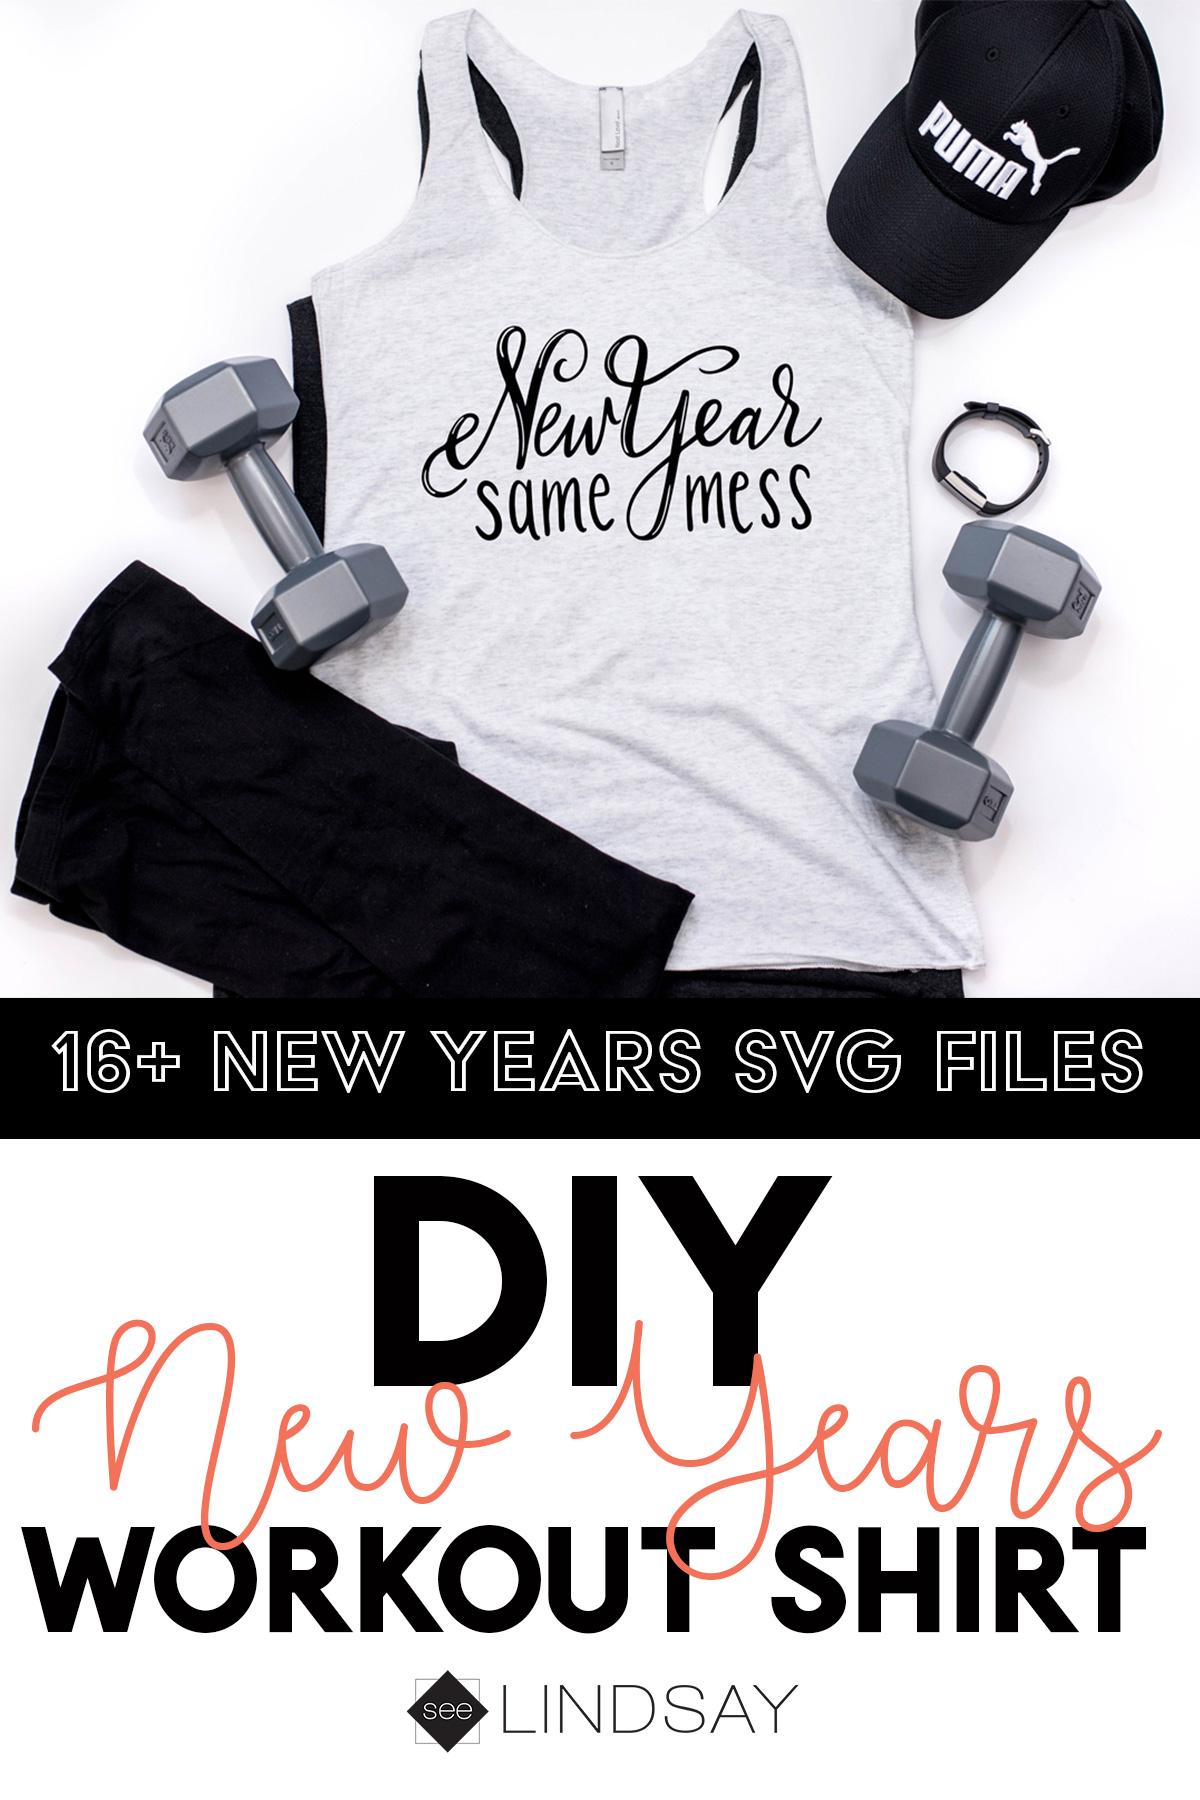 diy workout shirt new year same mess